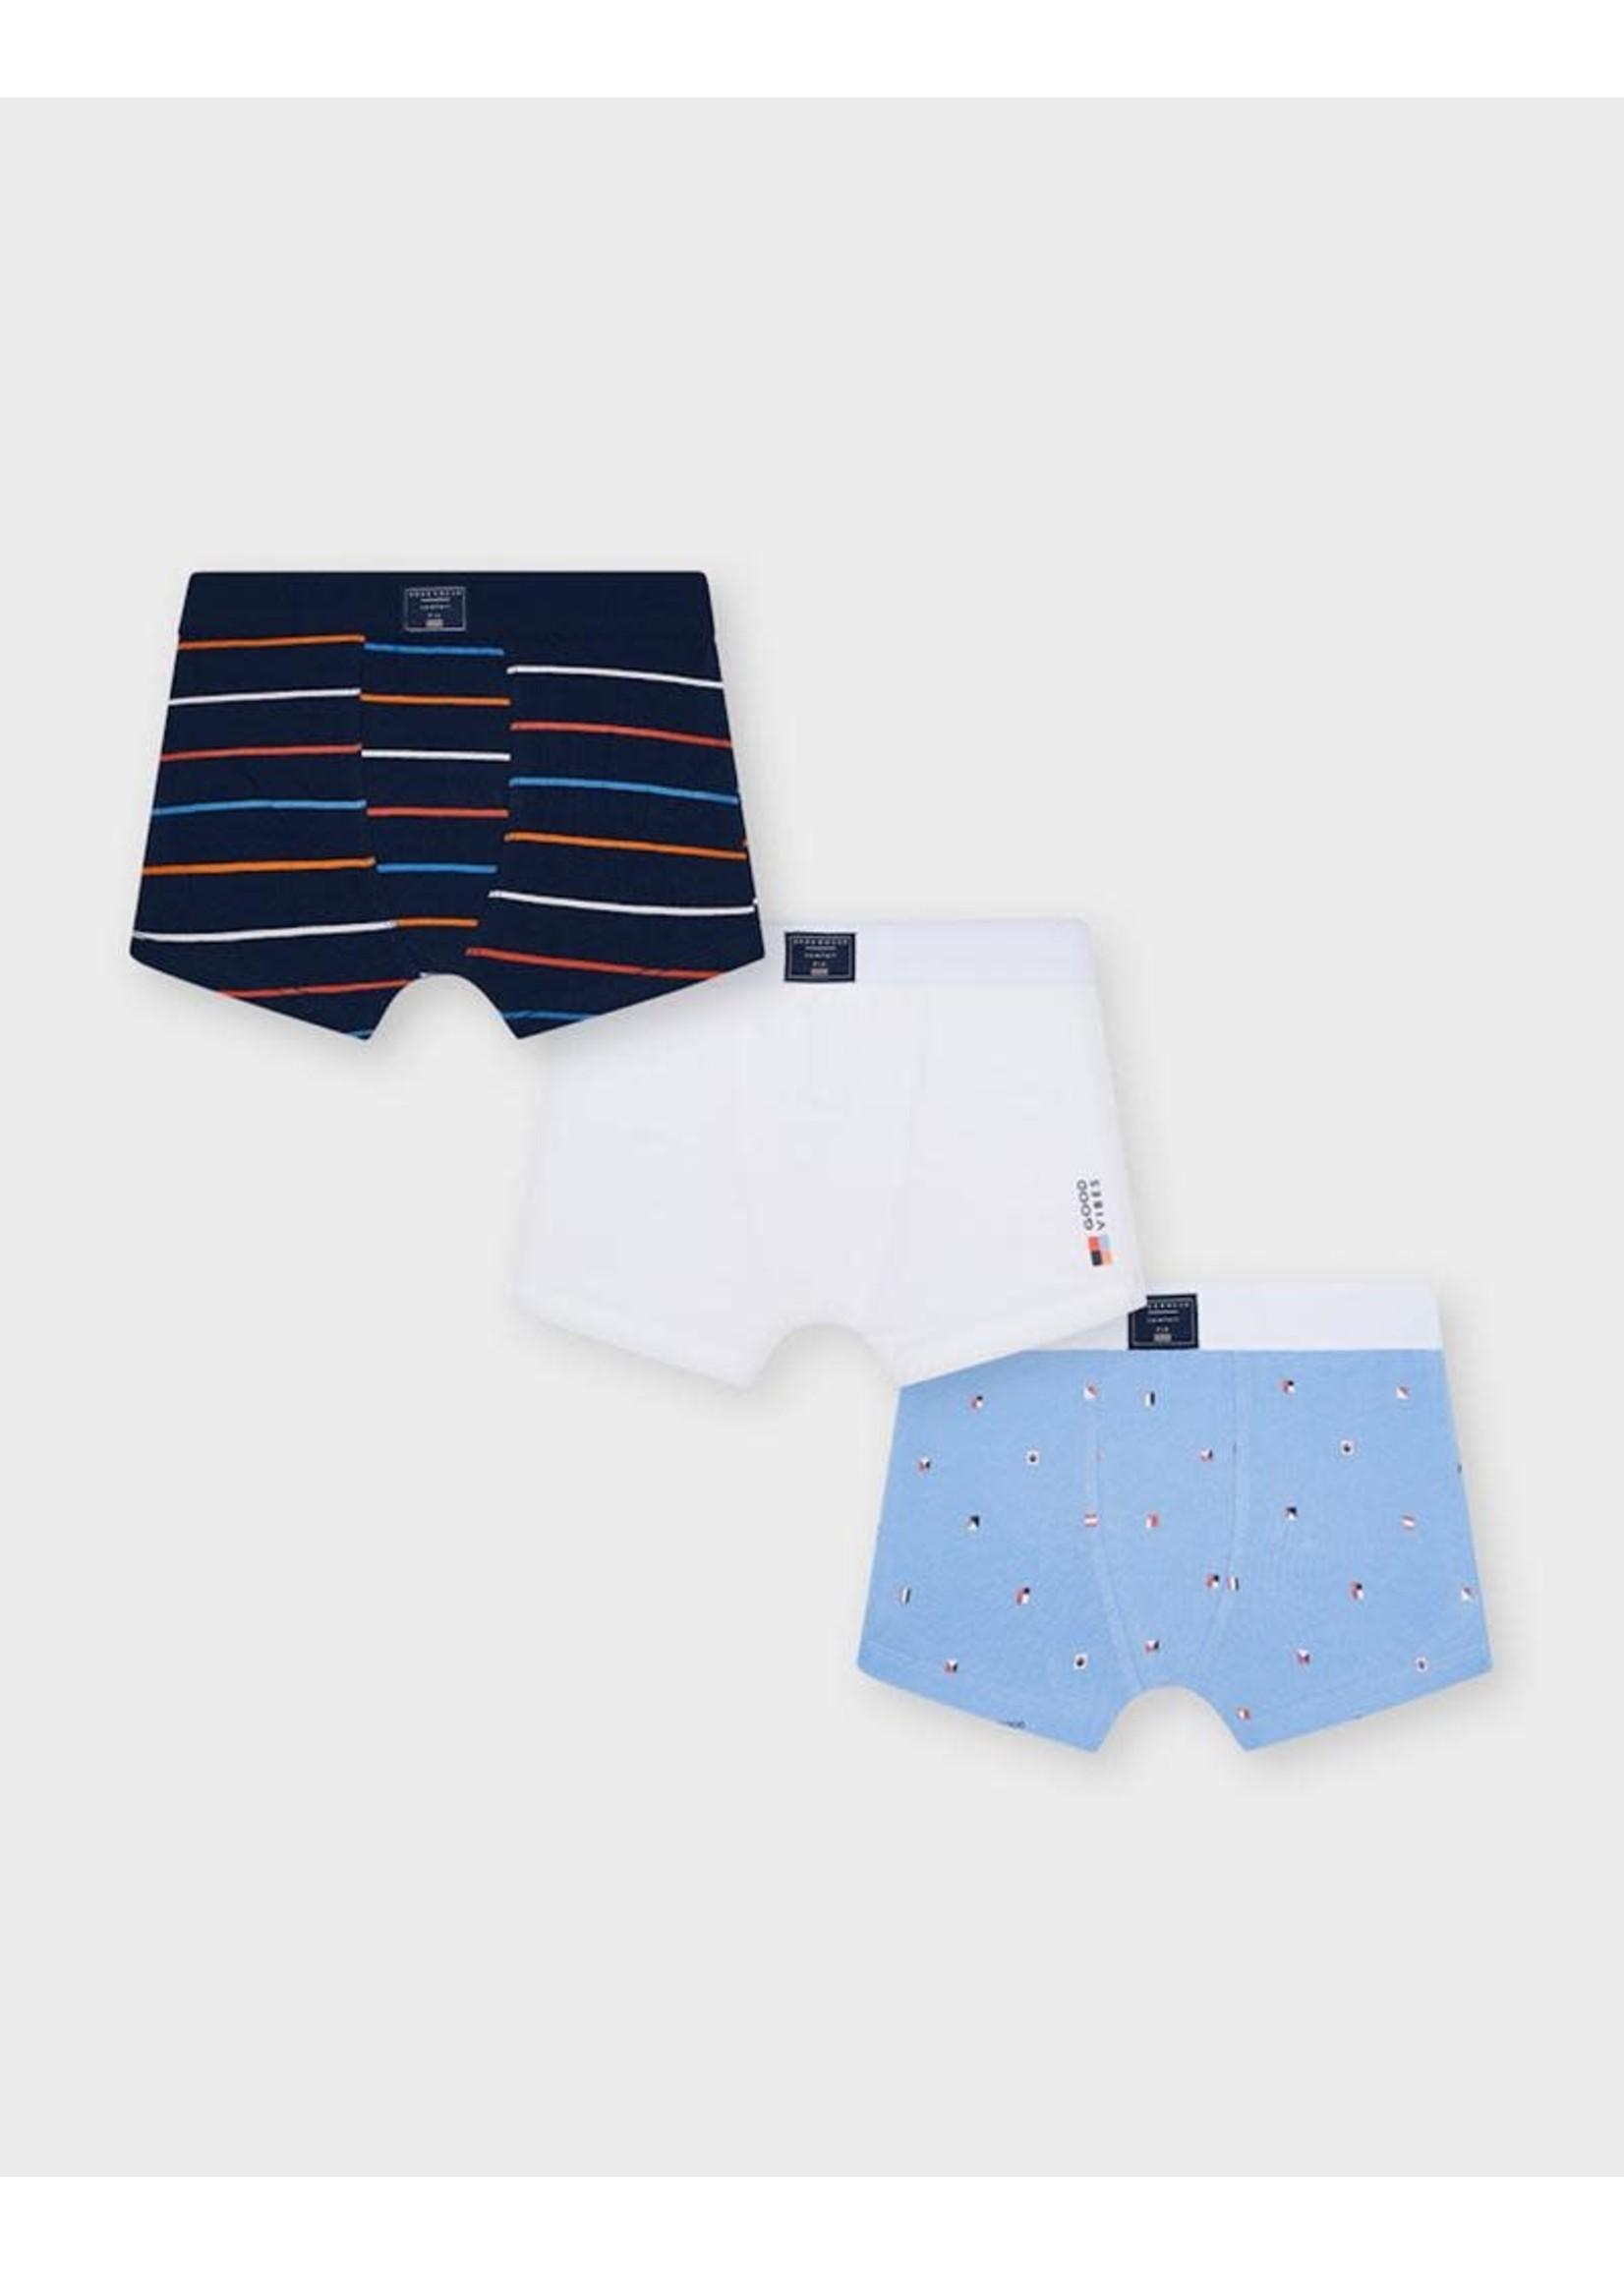 Mayoral Mayoral, Lavender Printed Boxer Shorts Set 3 pack